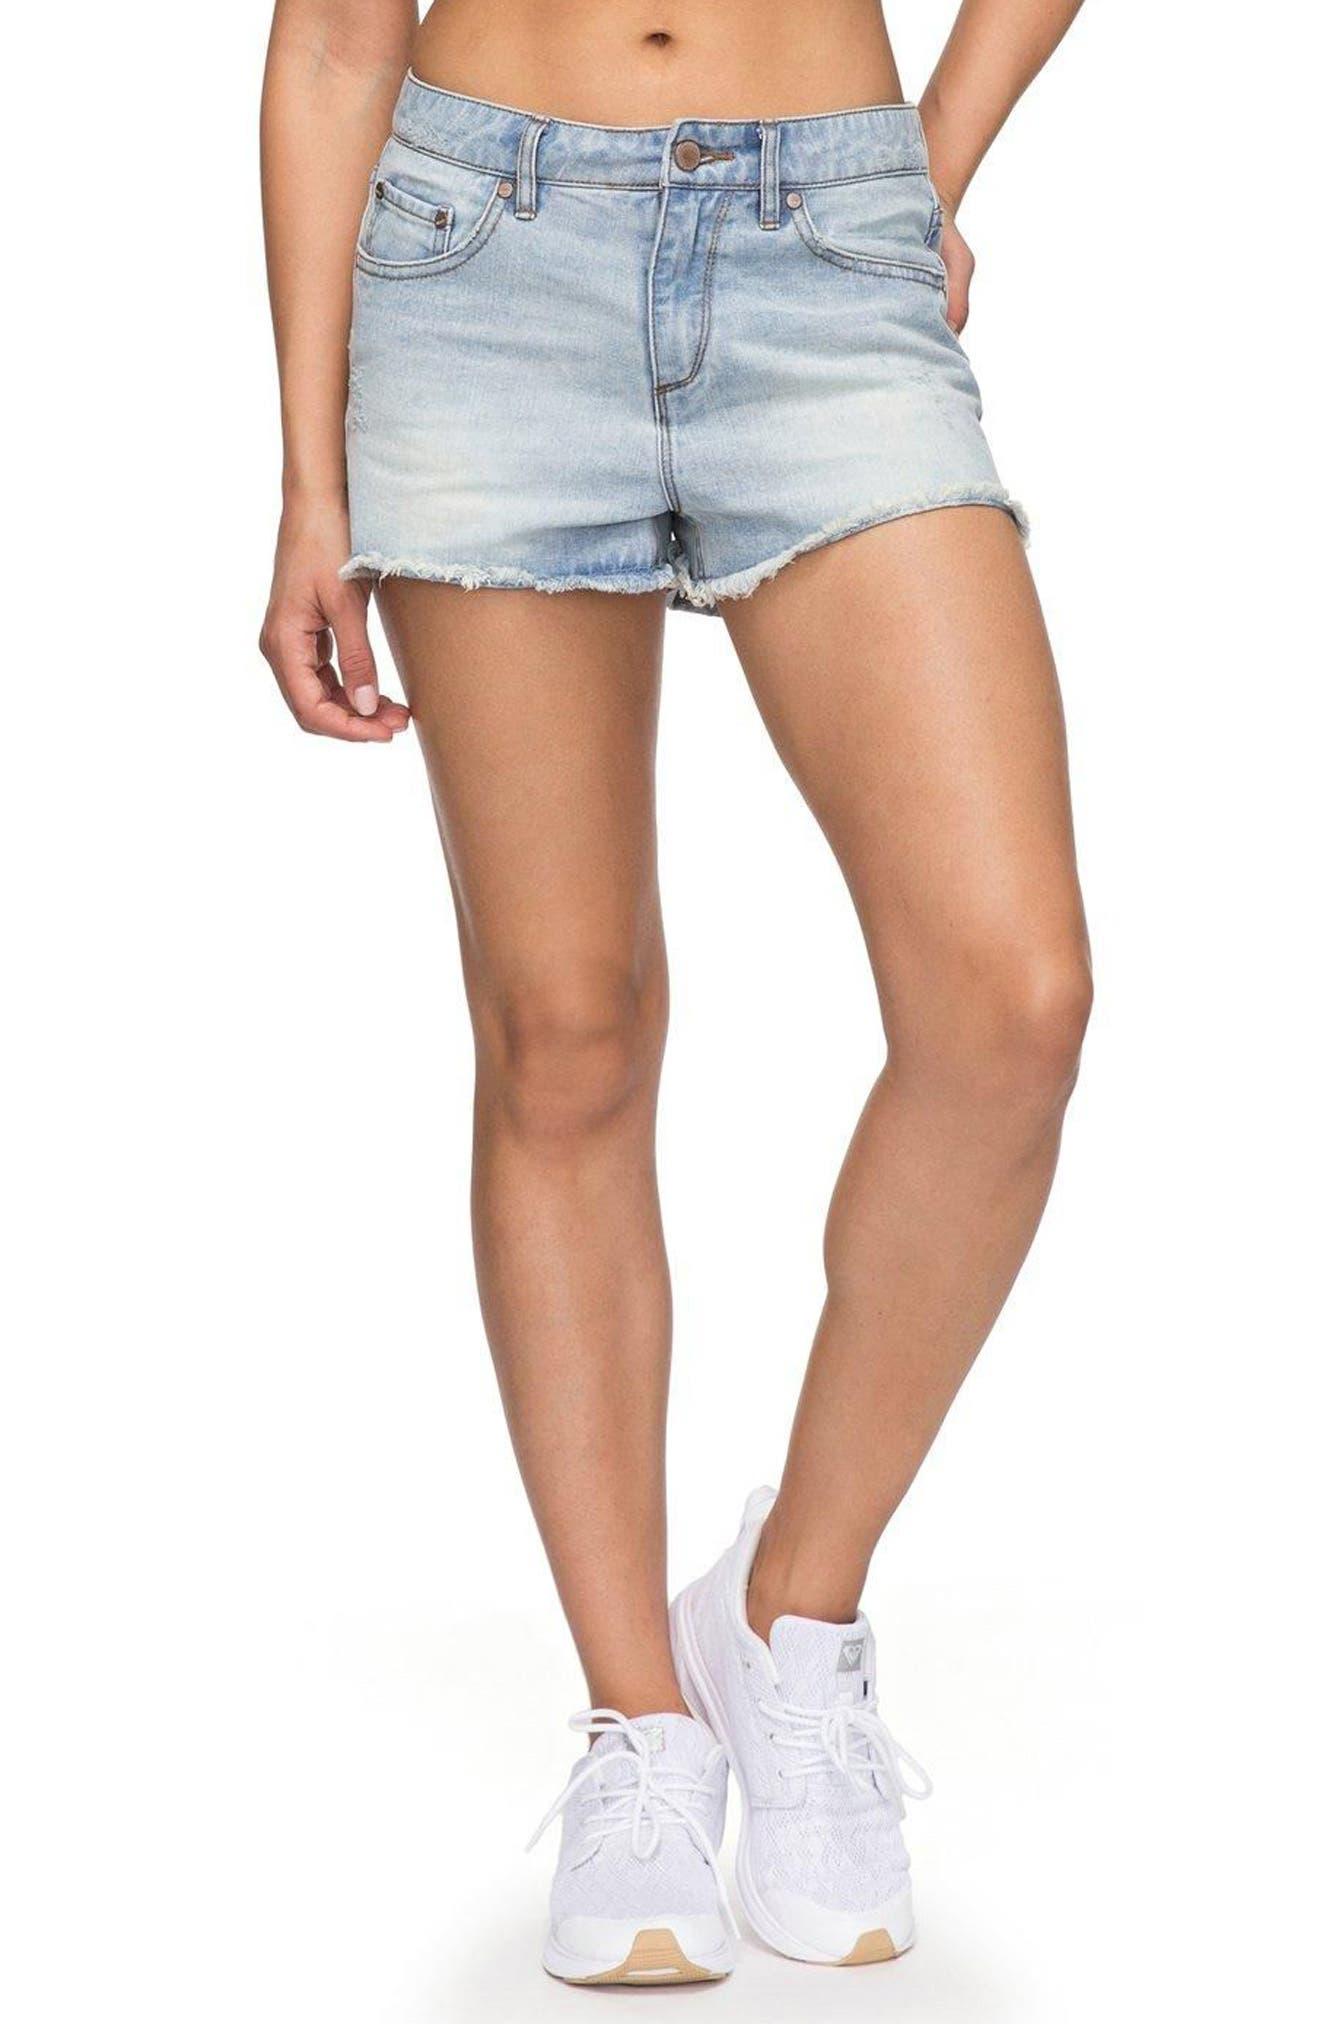 Little Abaco Cutoff Denim Shorts,                         Main,                         color, Light Blue